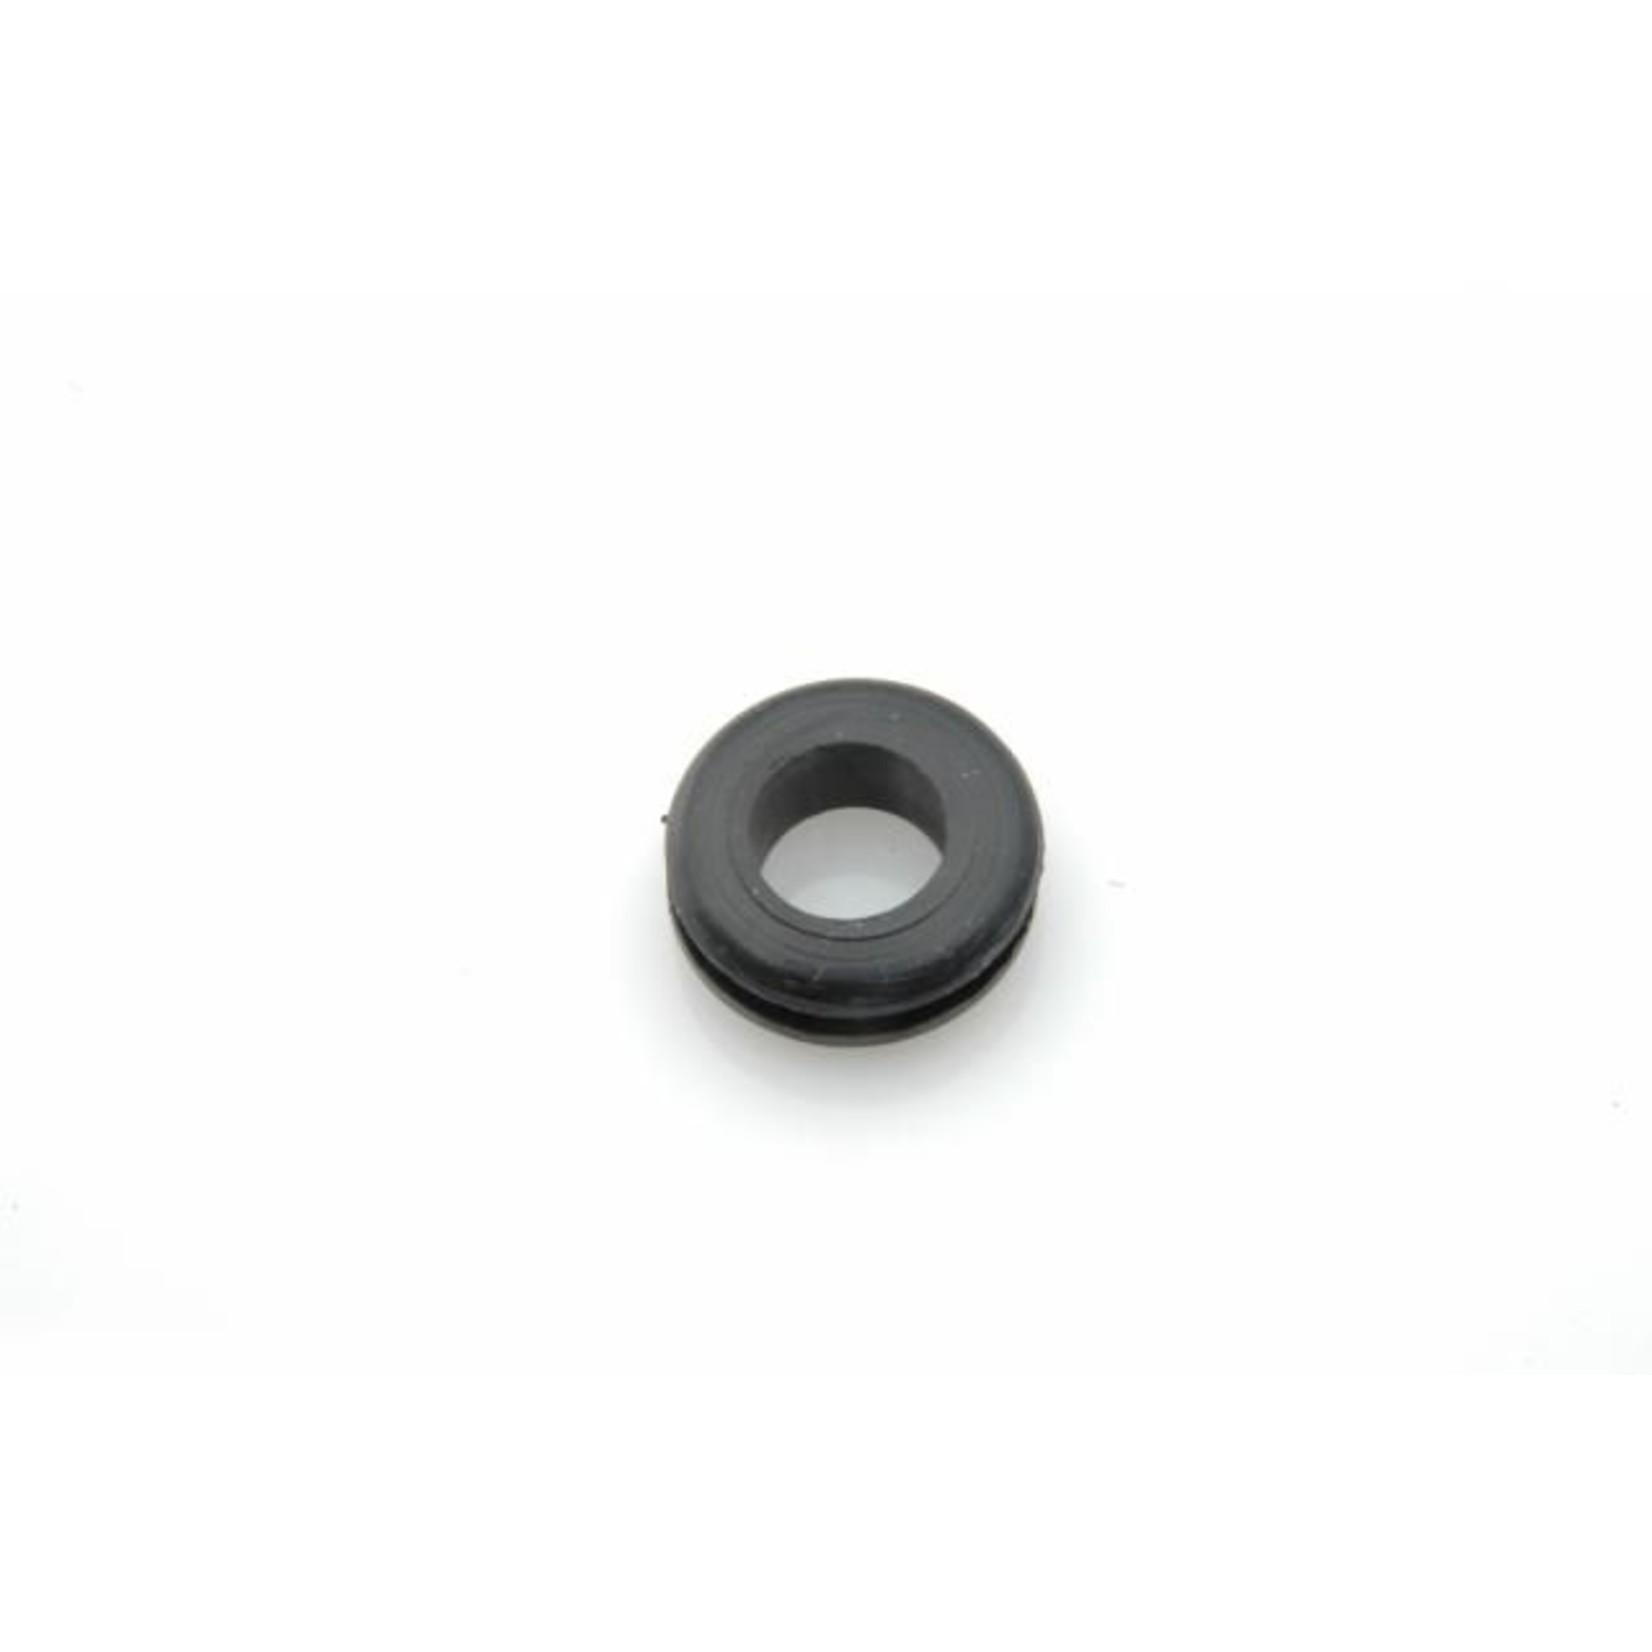 Doorvoerrubber motorkapkabel 10mm Nr Org: 21066009